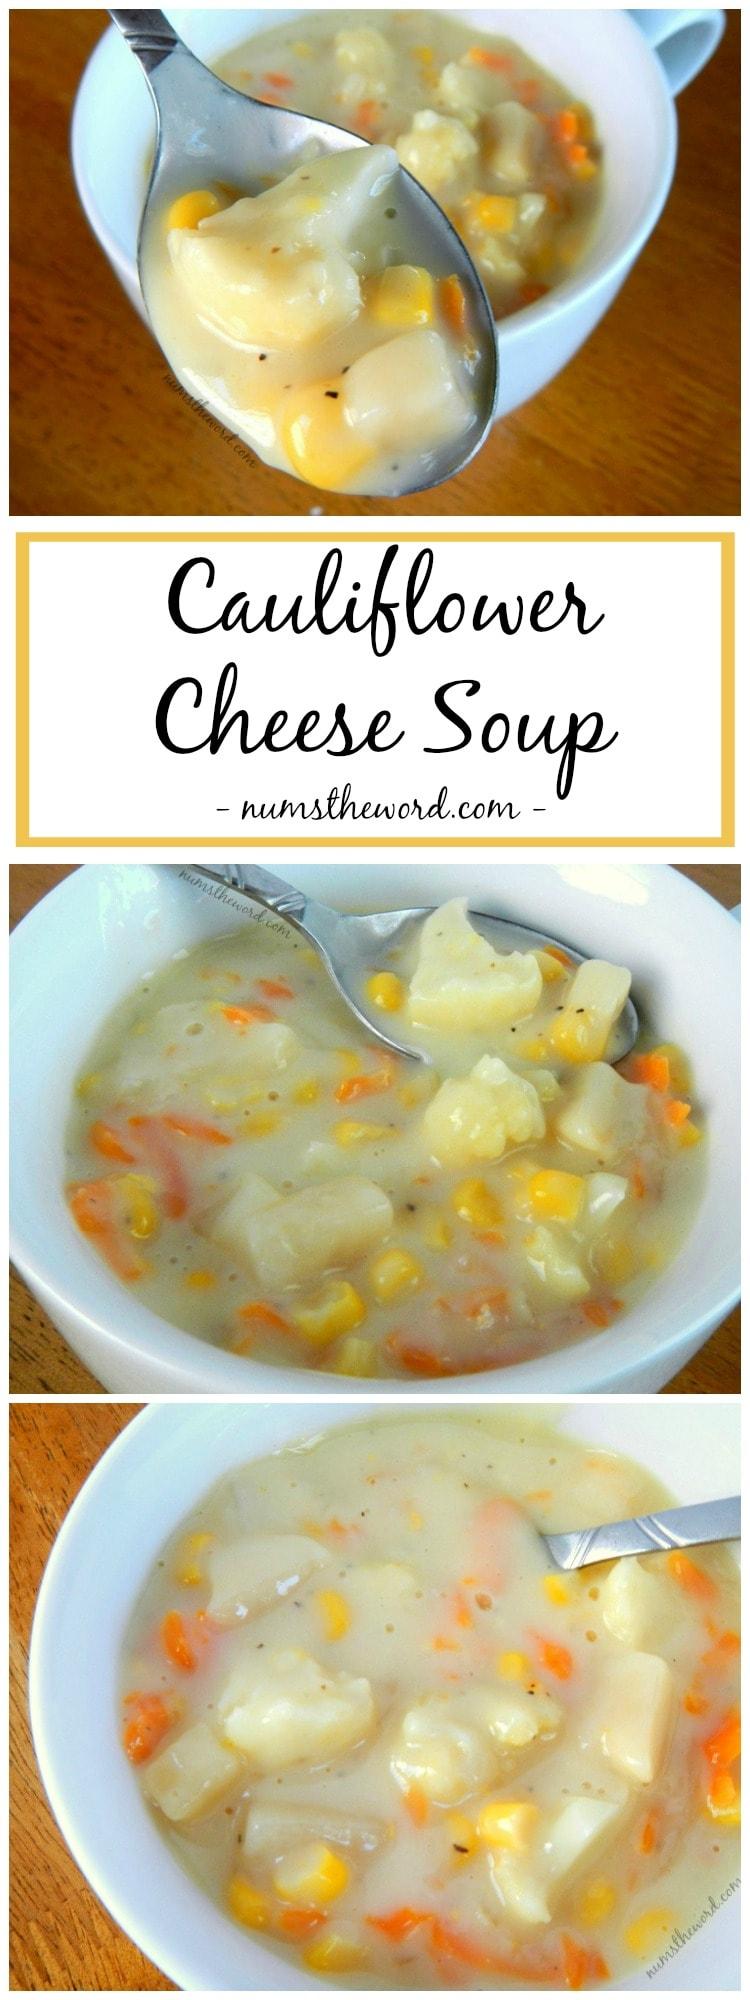 Easy Cauliflower Cheese Soup